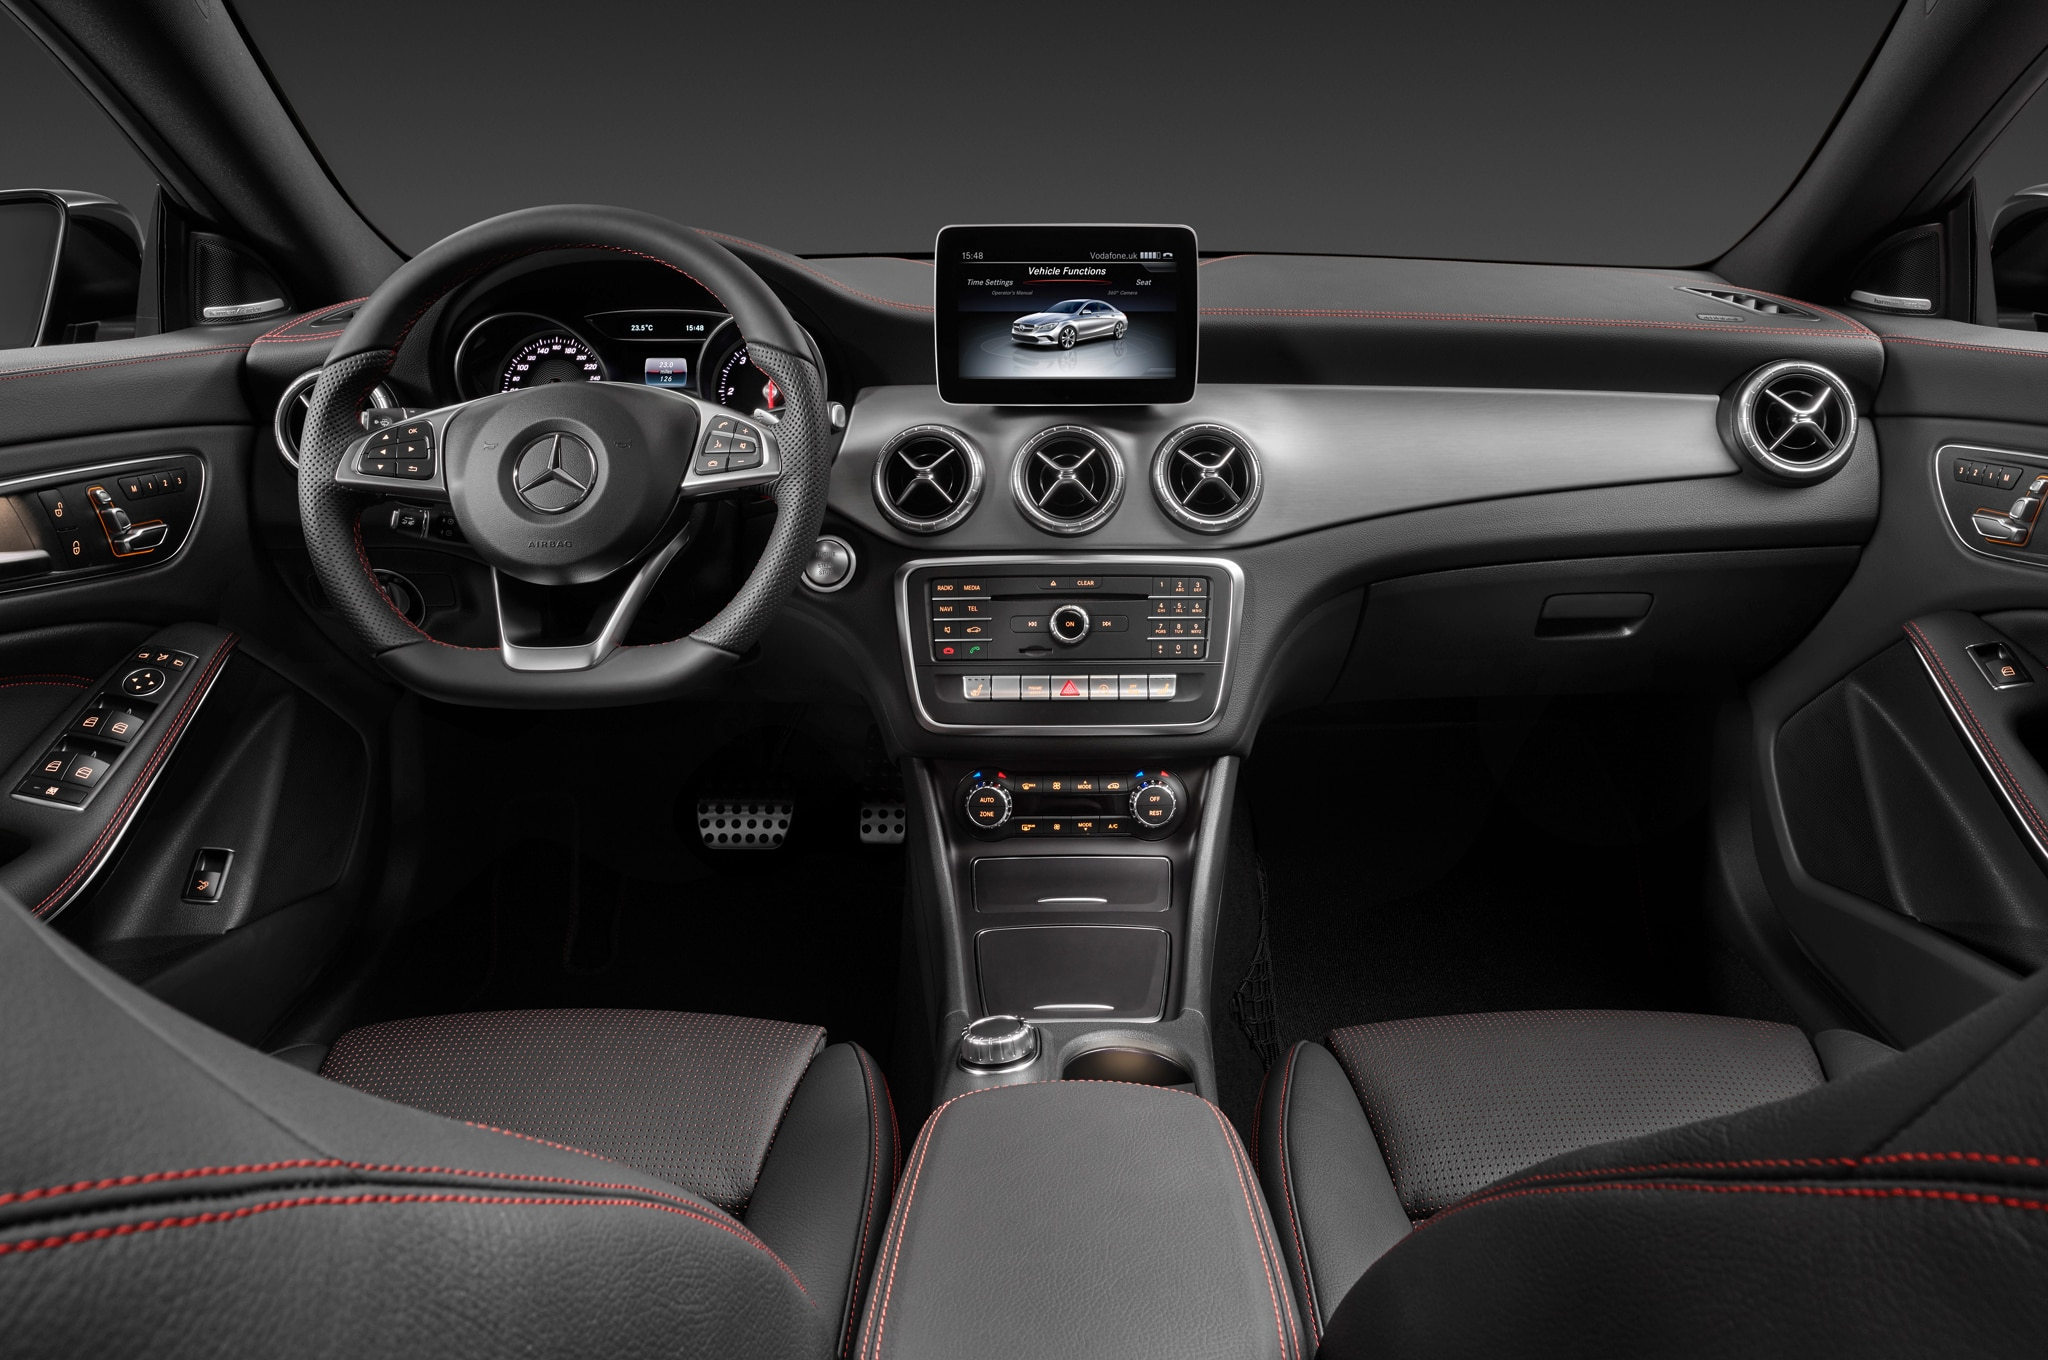 http://st.automobilemag.com/uploads/sites/11/2016/03/2017-Mercedes-Benz-CLA-interior-02.jpg